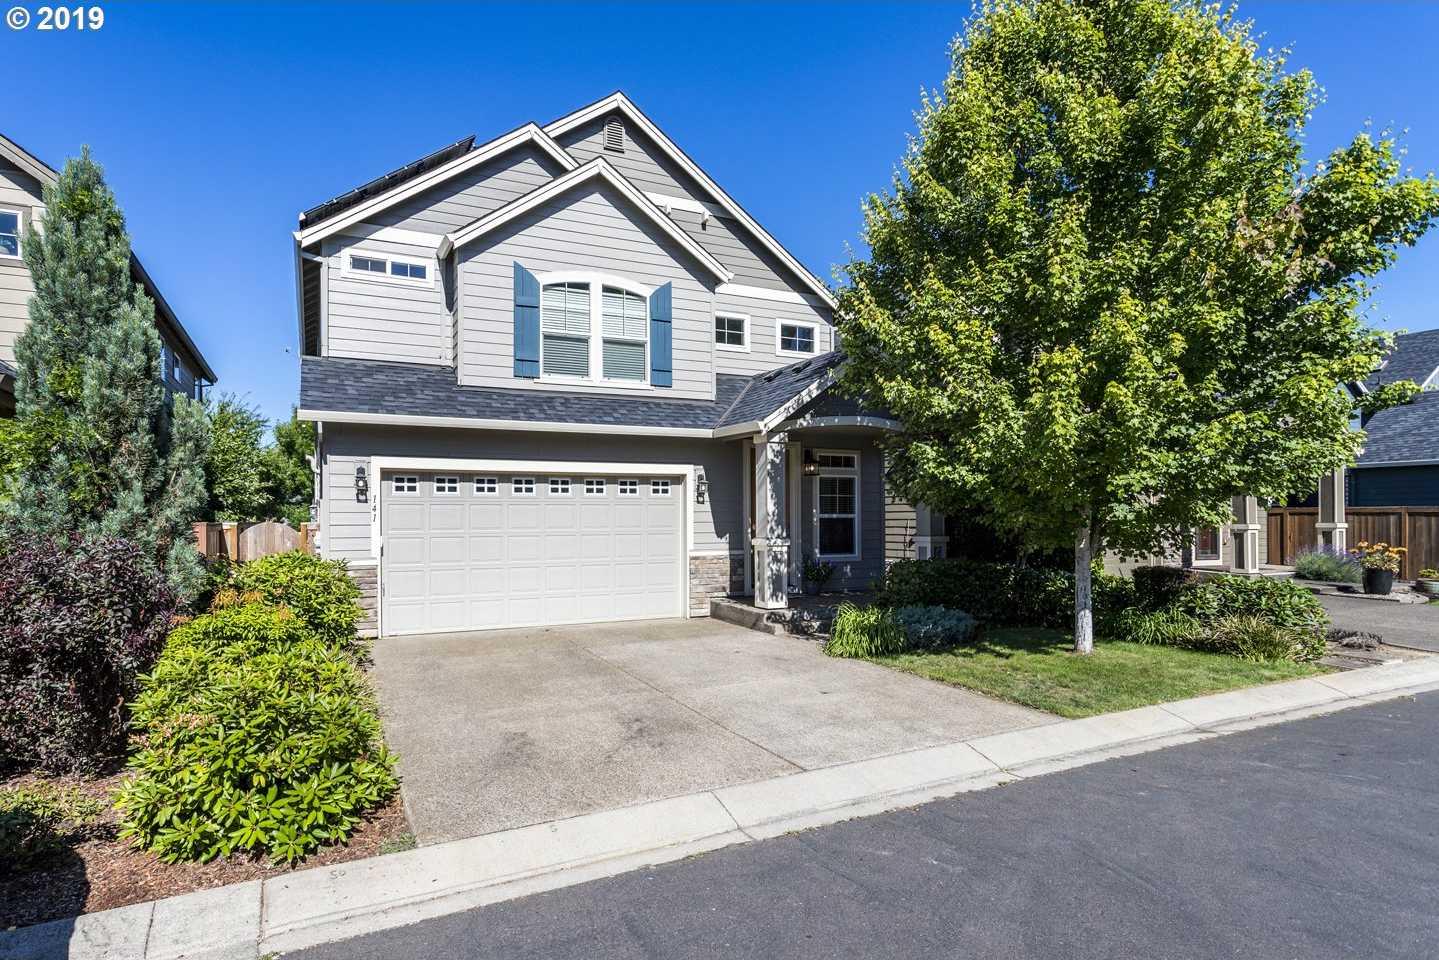 $534,900 - 4Br/3Ba -  for Sale in Hillsboro